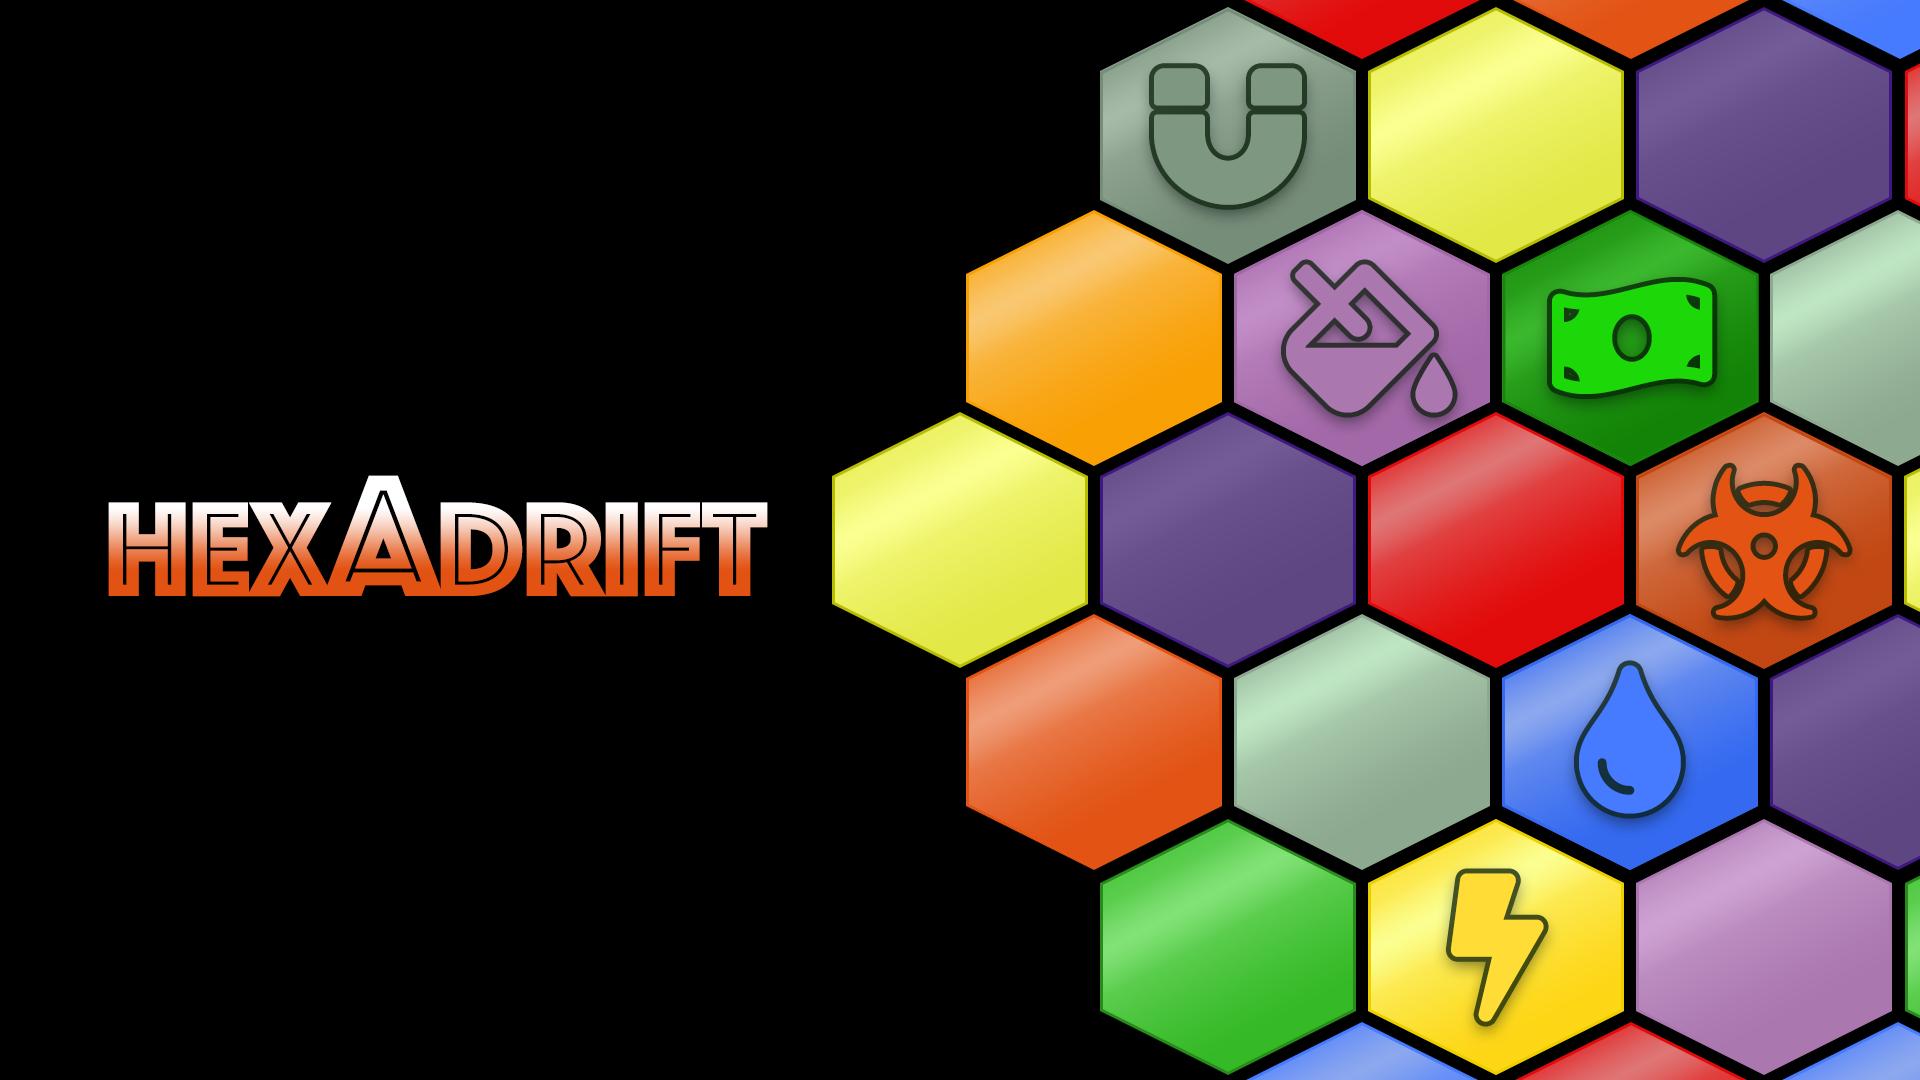 Hexadrift